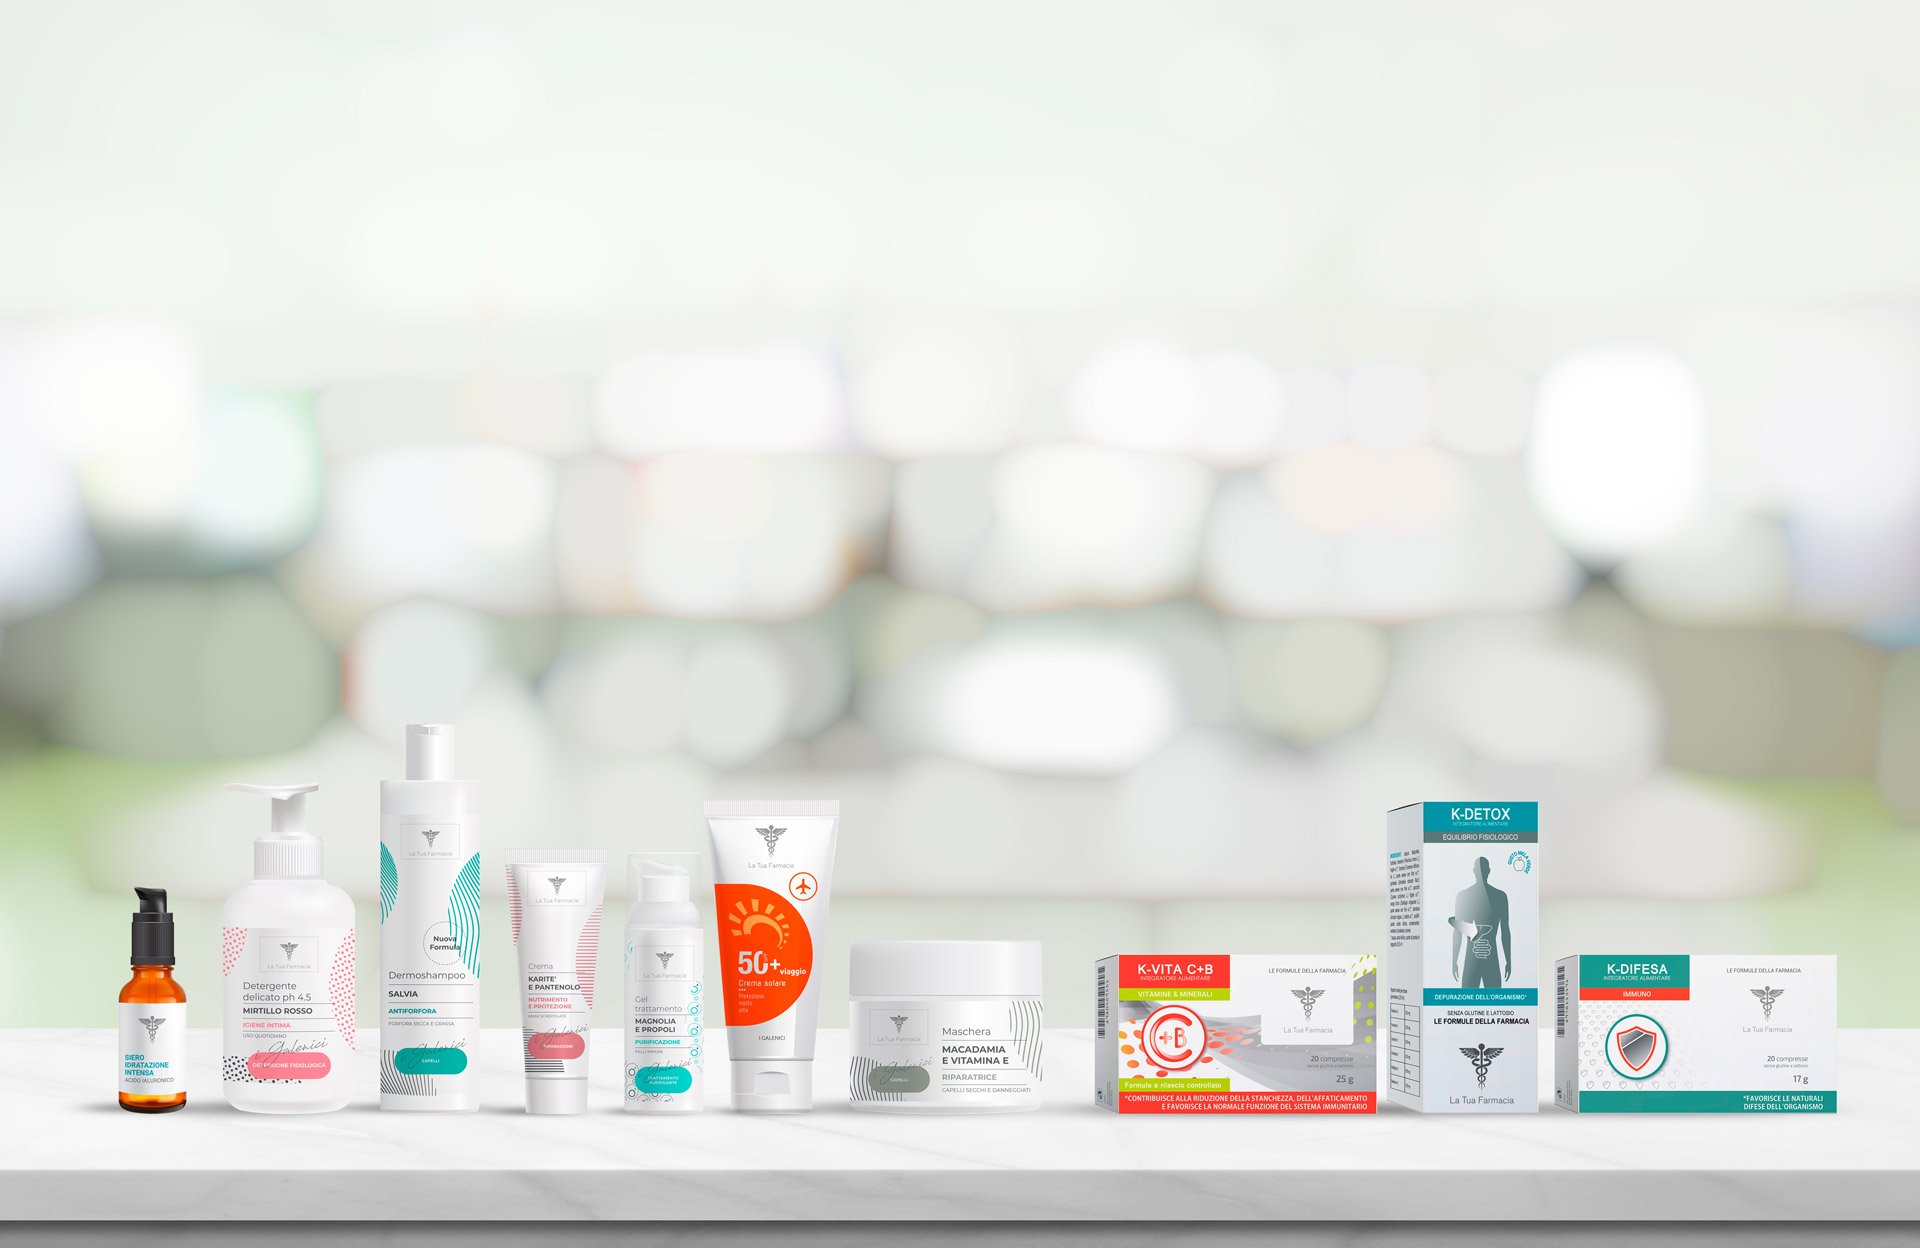 Integratori-e-cosmetici-Kalis1